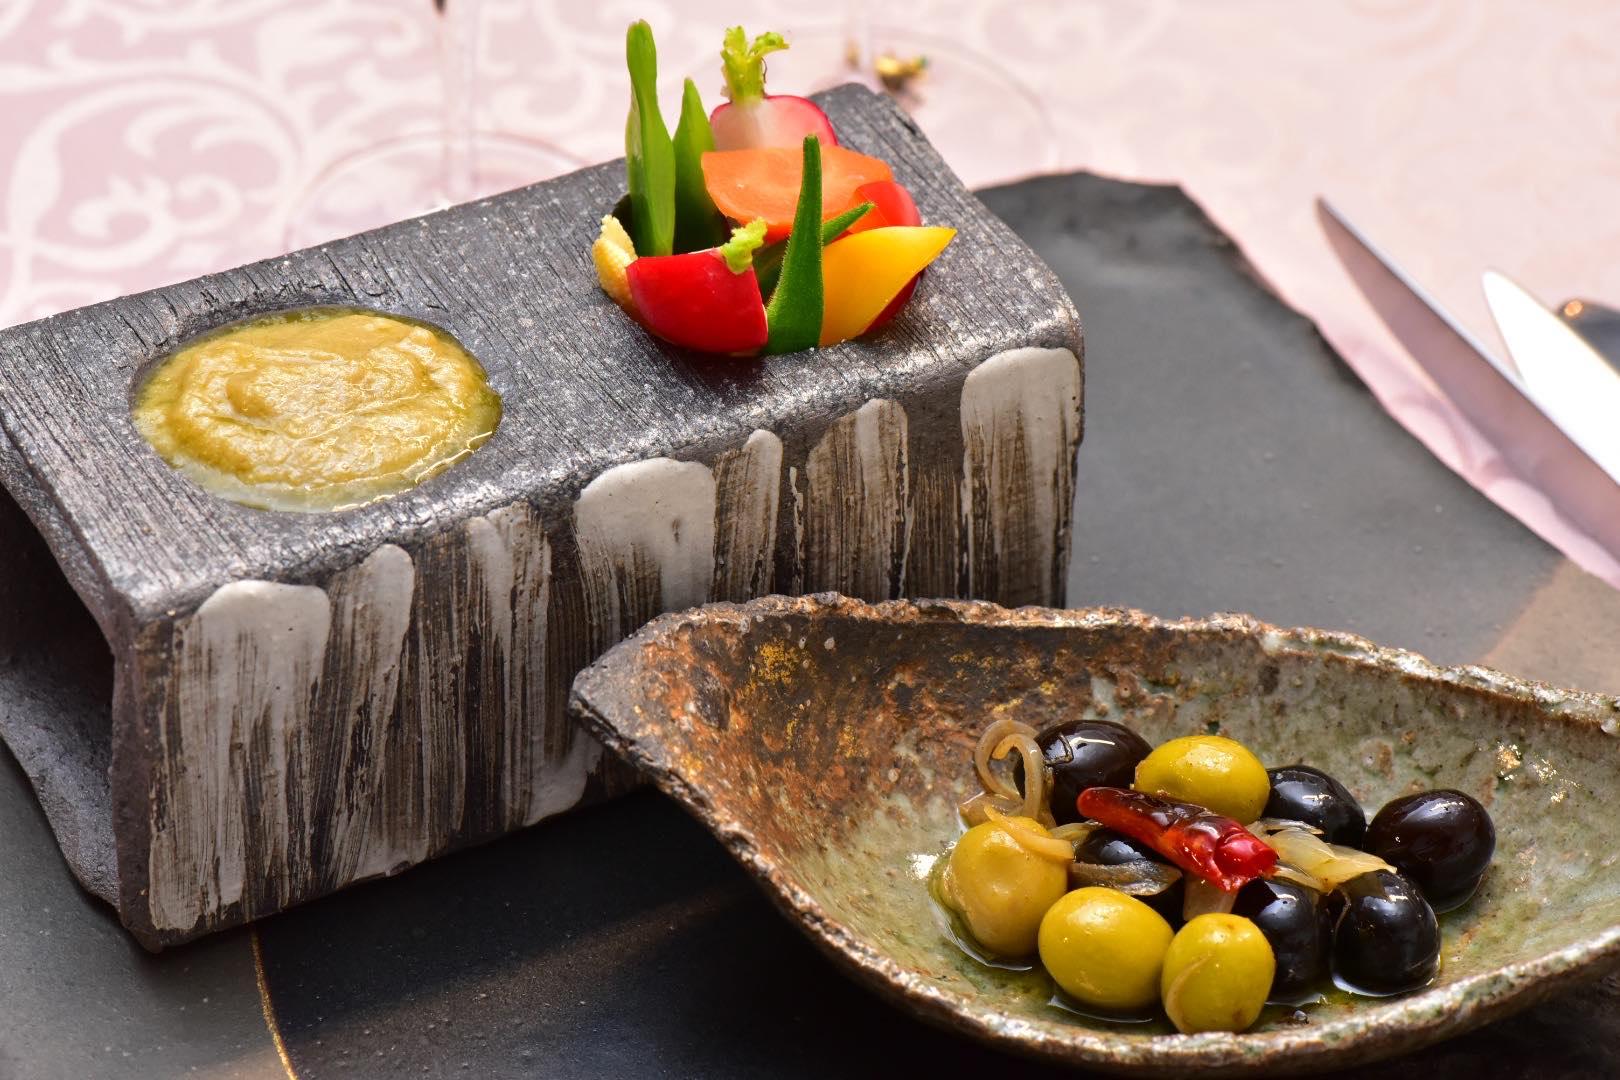 大崎・五反田の料理教室Biensur